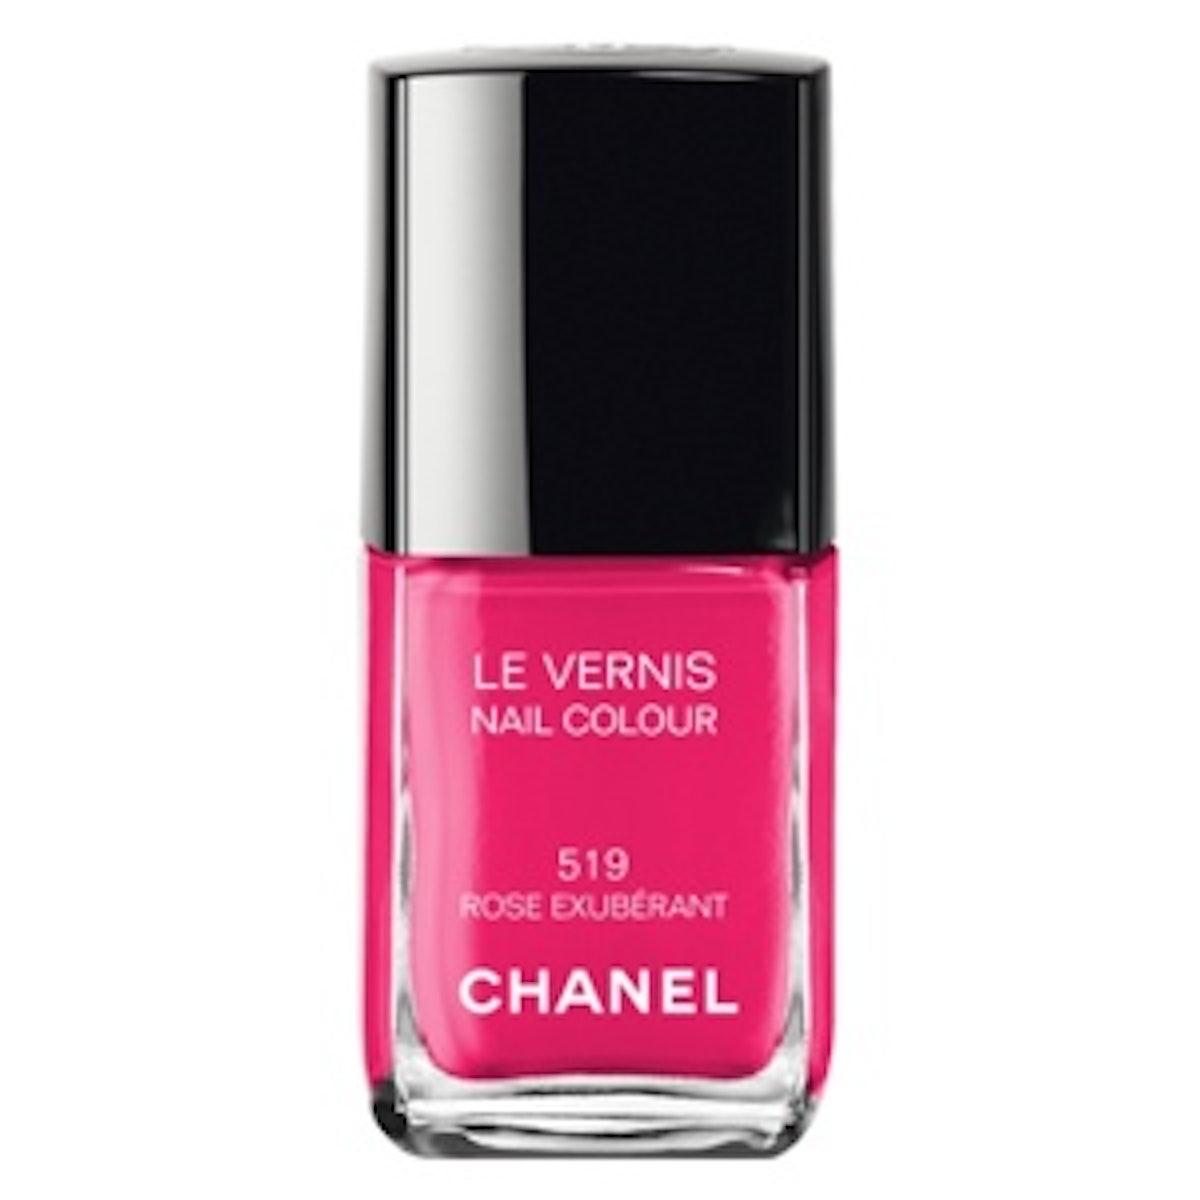 Le Vernis Nail Color in Rose Exuberant 519